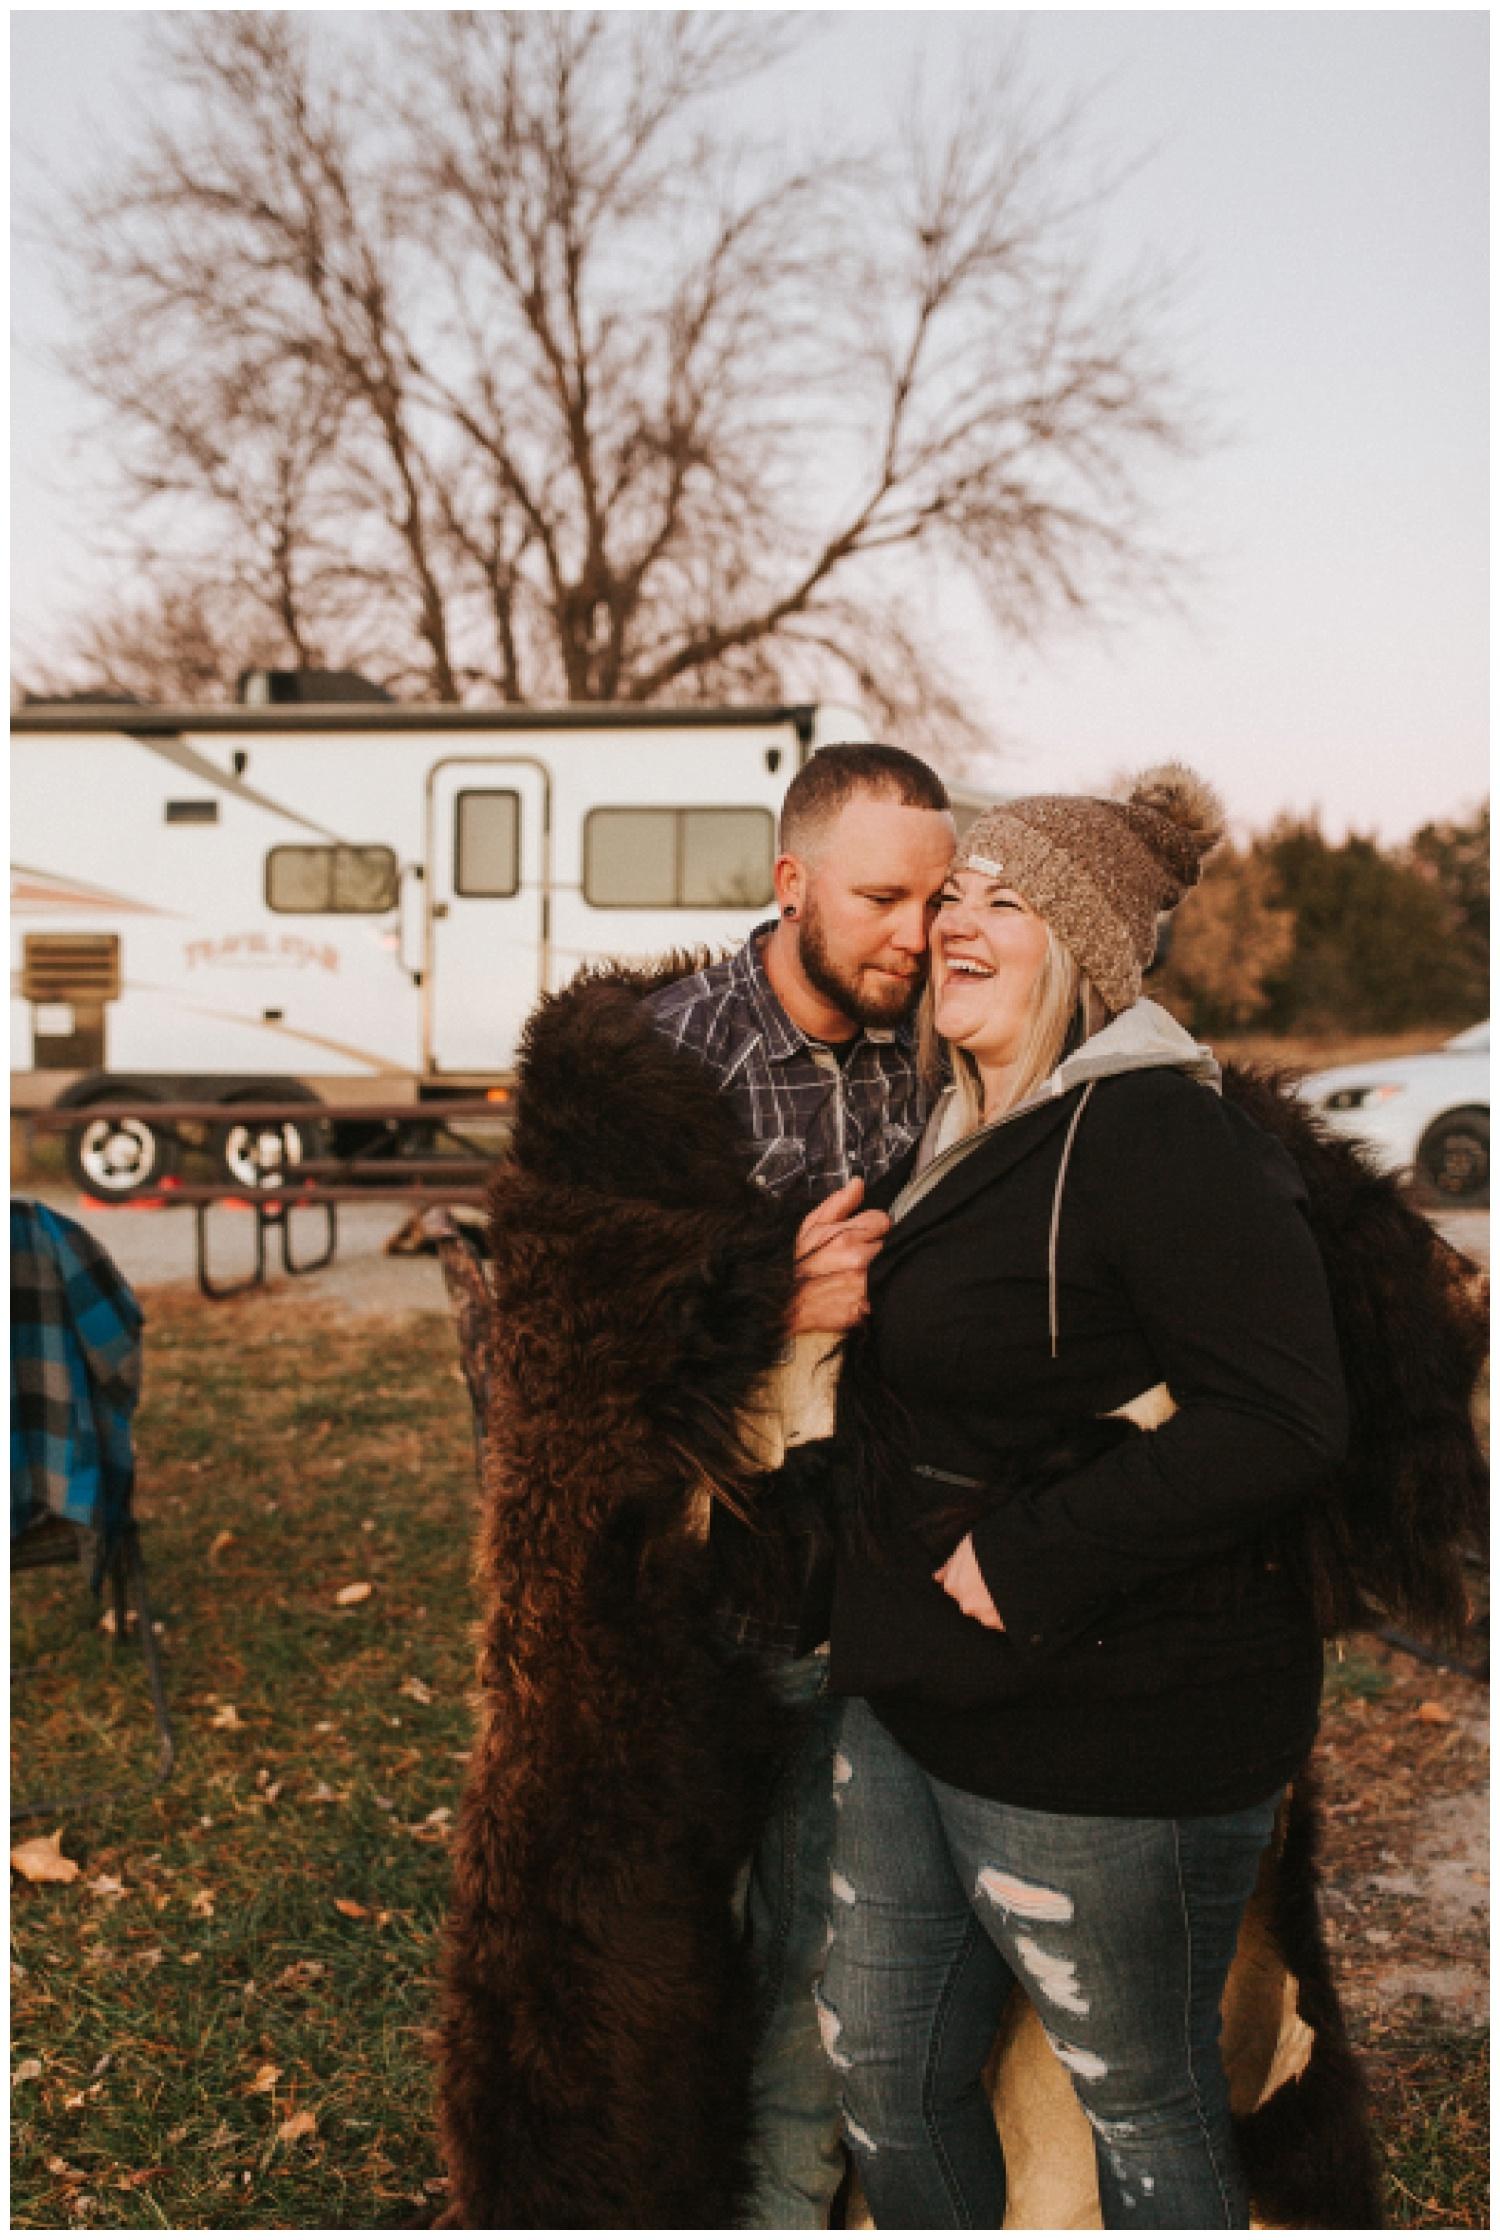 cozy_campfire_campsite_engagement_anniversary_session_nebraska_photographer_haley_chicoine_adventureous_wedding_0030.jpg